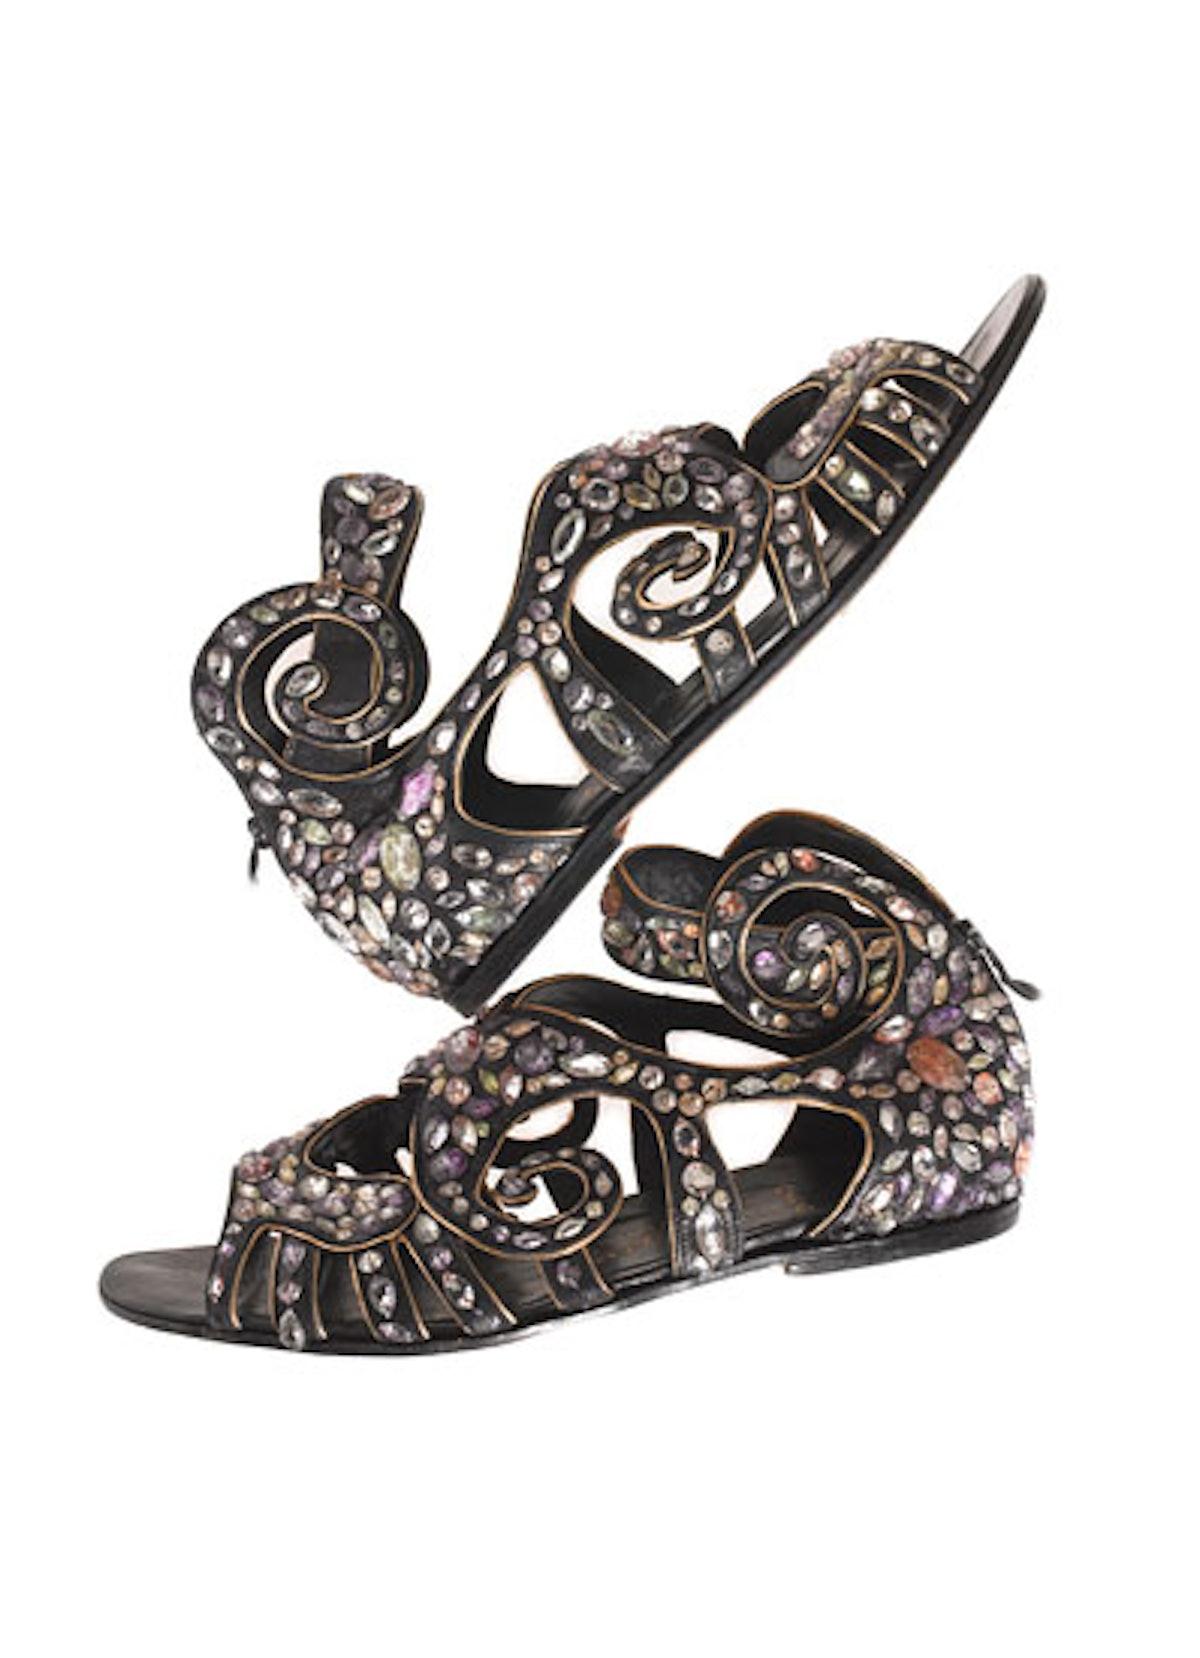 acss-baroque-accessories-09-v.jpg